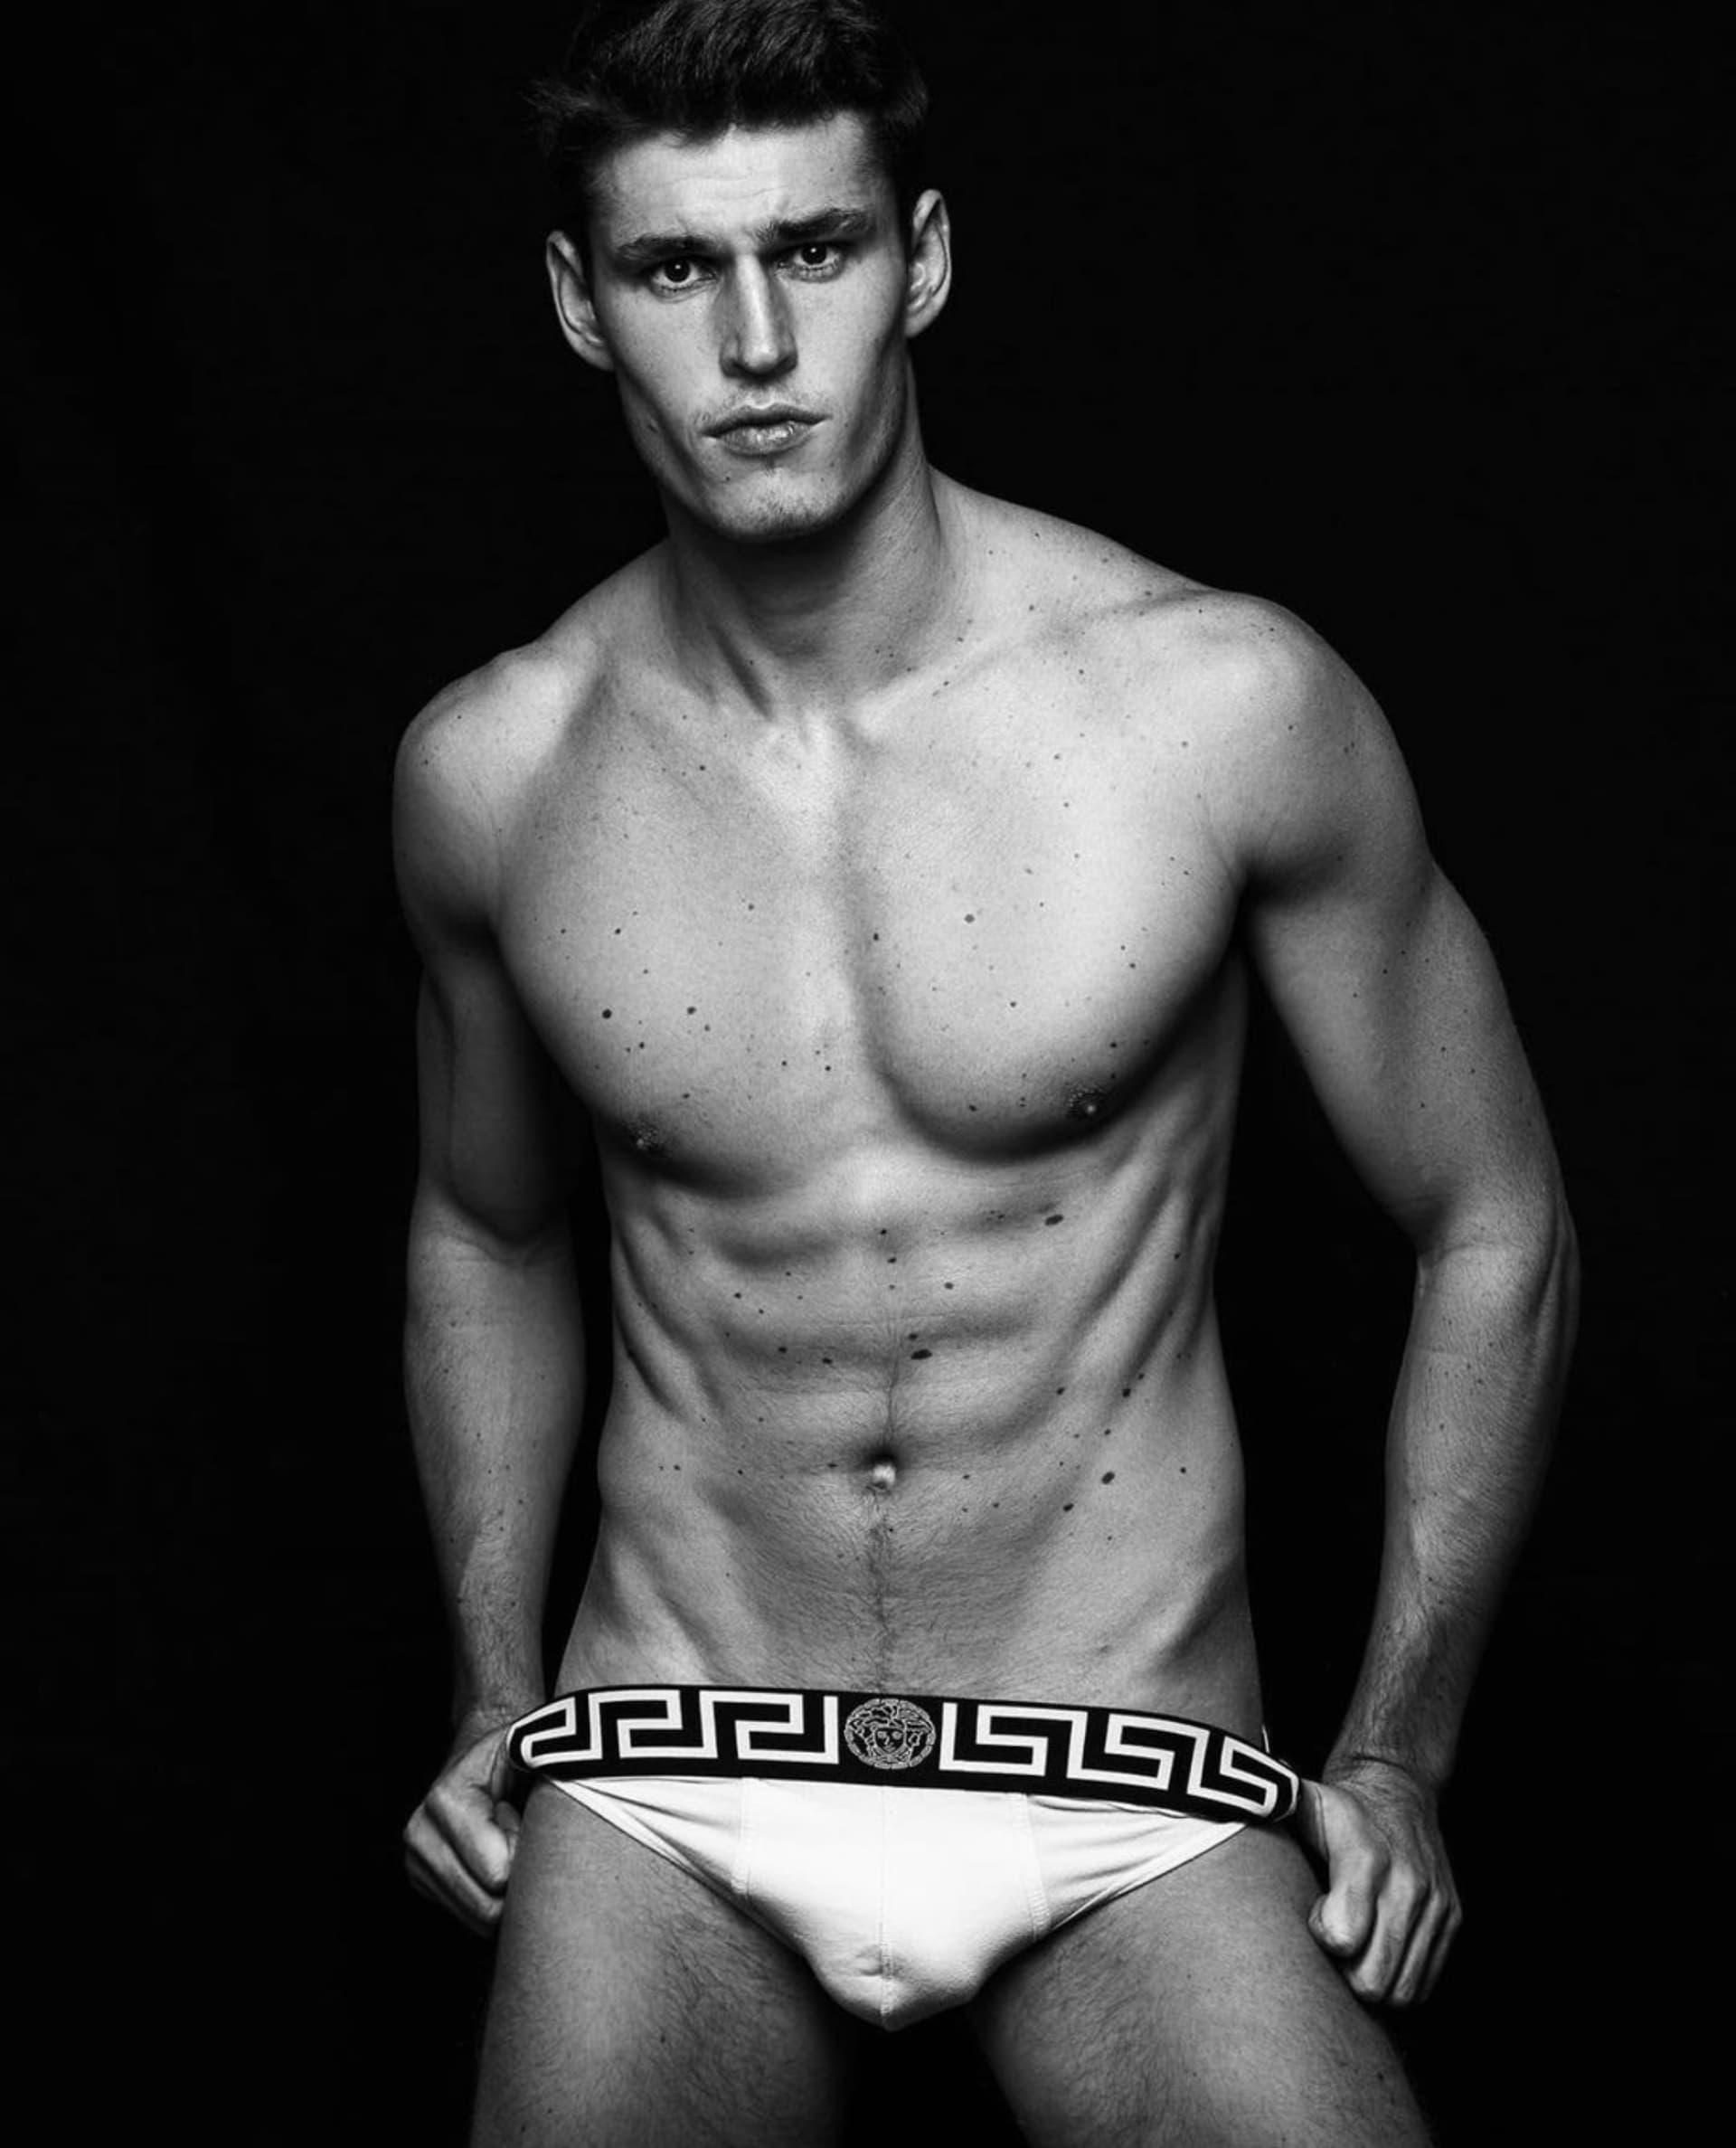 Victor Perr, el modelo francés que cautiva a mas de uno